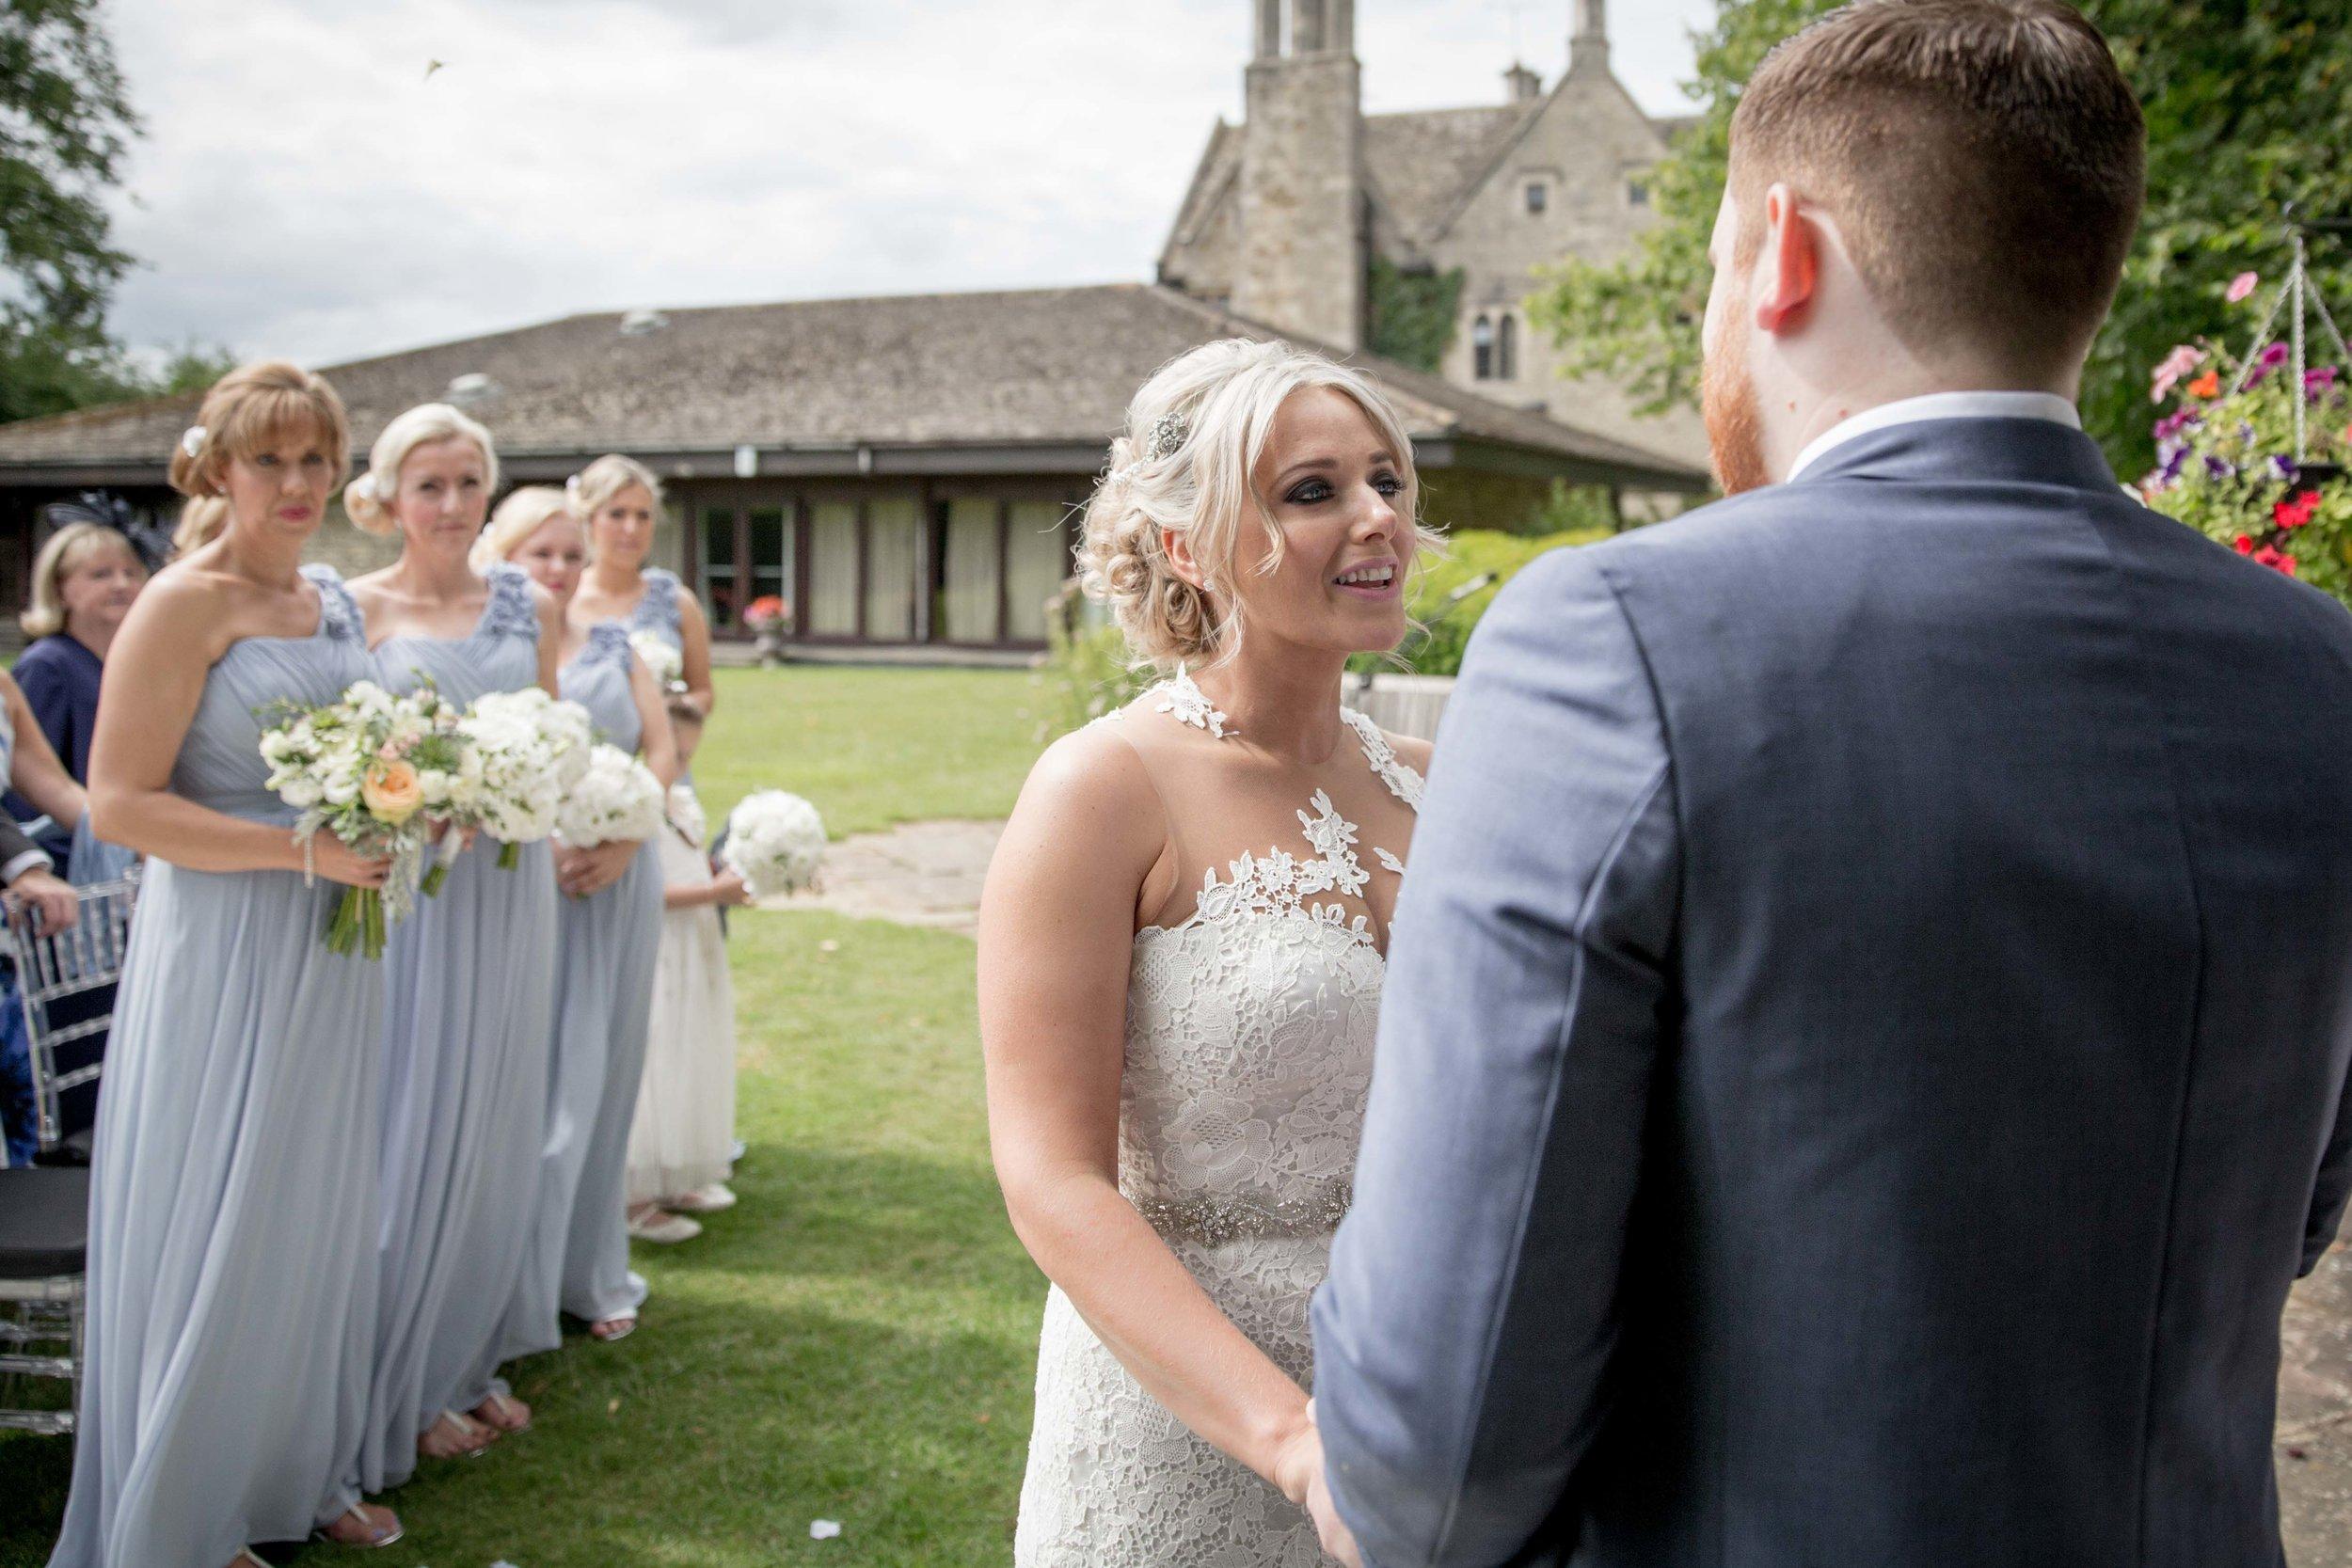 cotswold-wedding-photography-at-stonehouse-court-hotel-natalia-smith-photography-gloucestershire-wedding-photographer-19.jpg